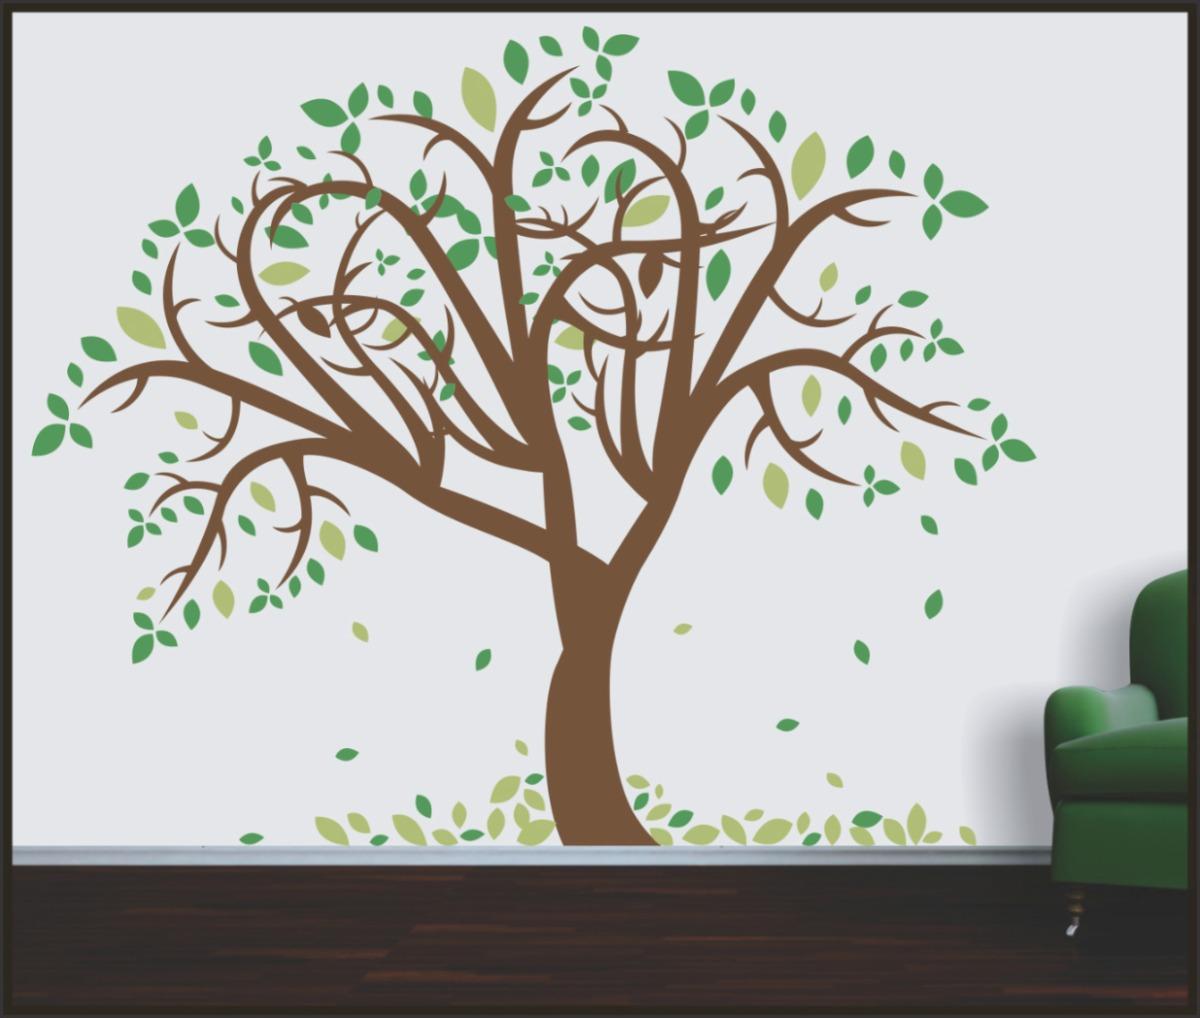 Adesivo Balao Pipa ~ Adesivo Decorativo Para Paredes,Árvore Tipuana Tam G R